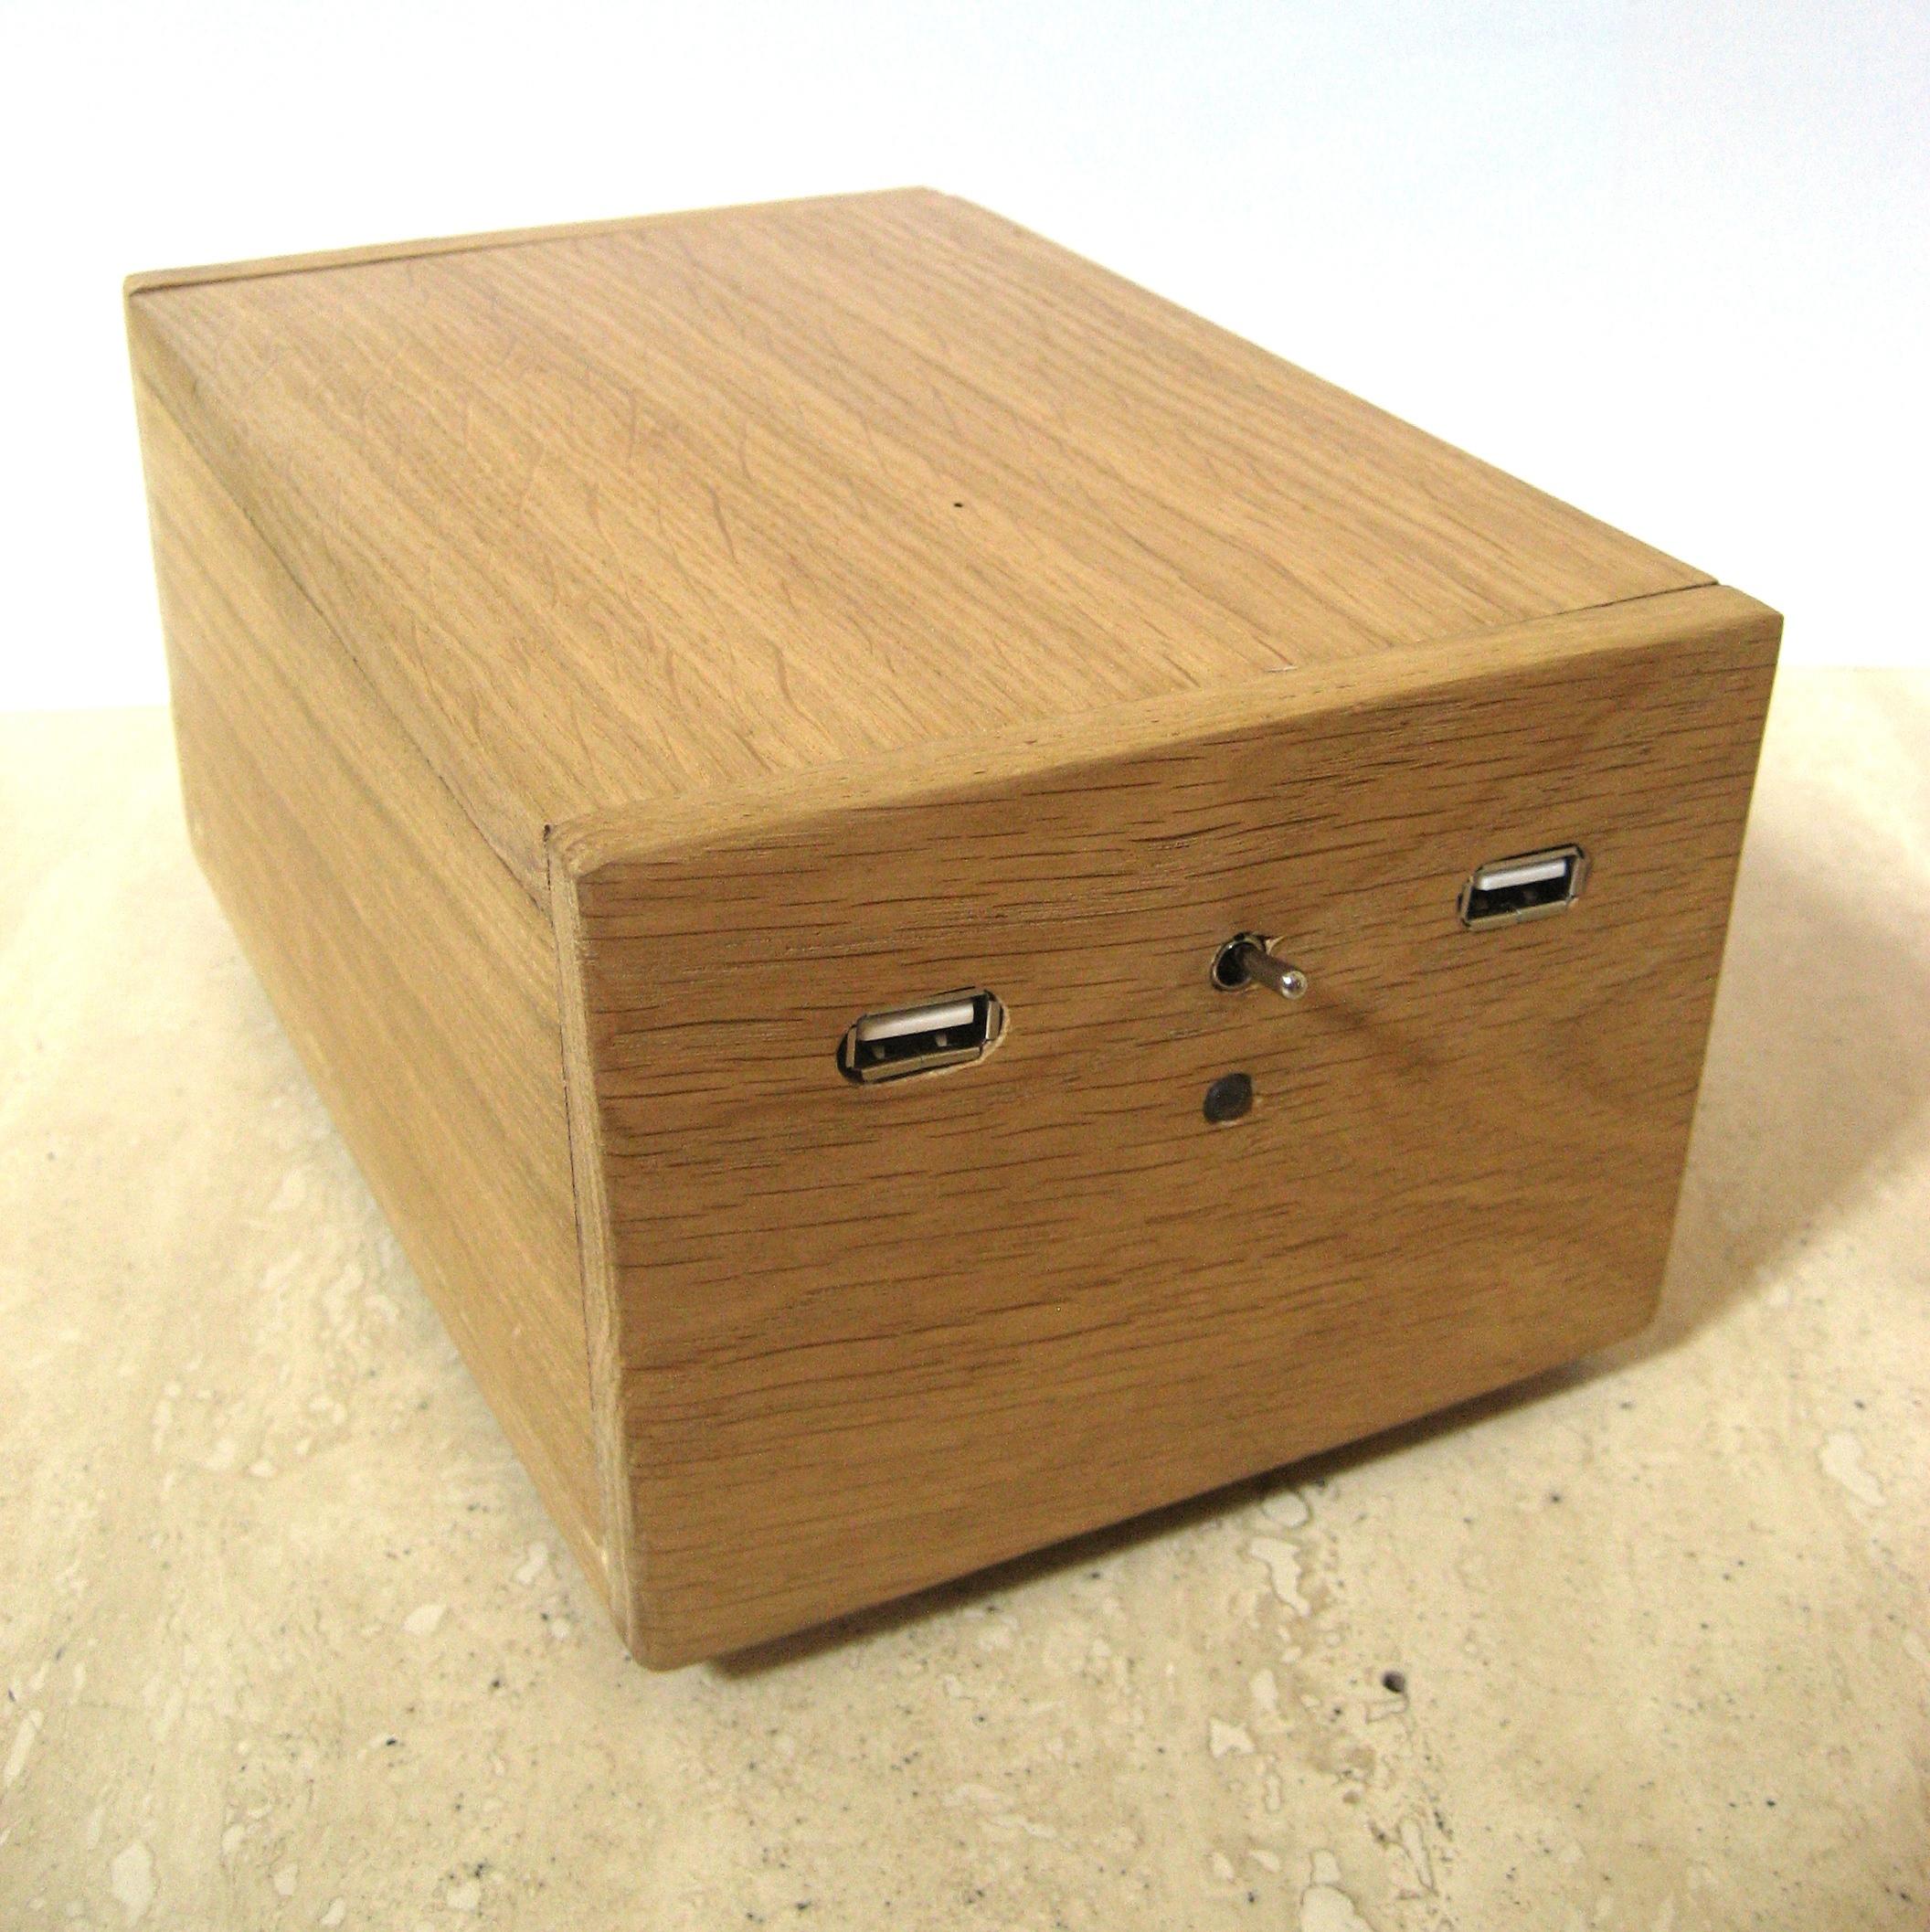 External hard drive + USB hub